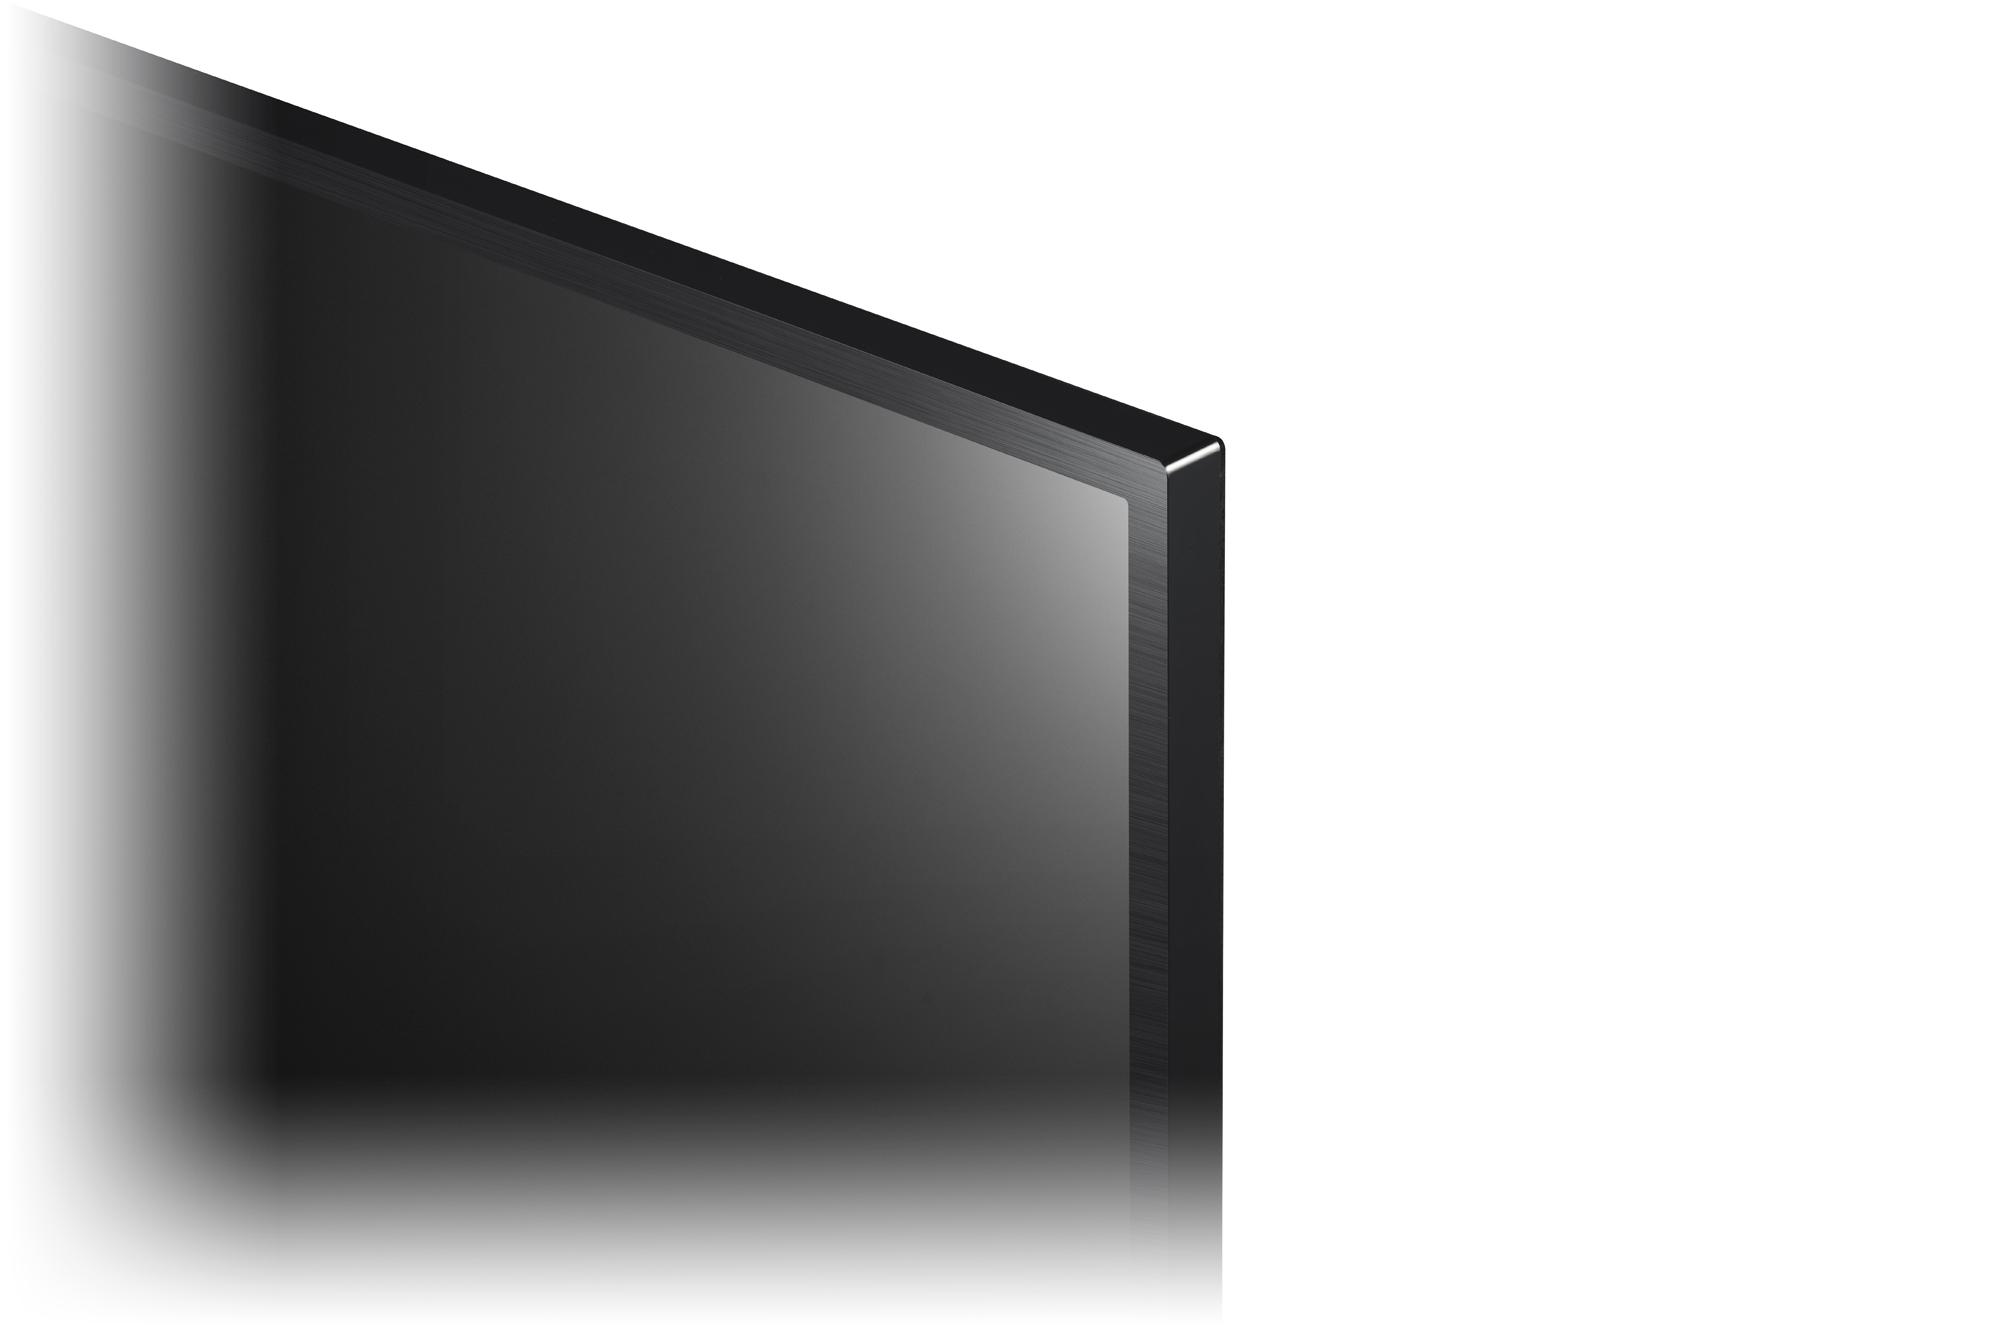 LG Smart TV Signage 43UT640S (CIS) 11